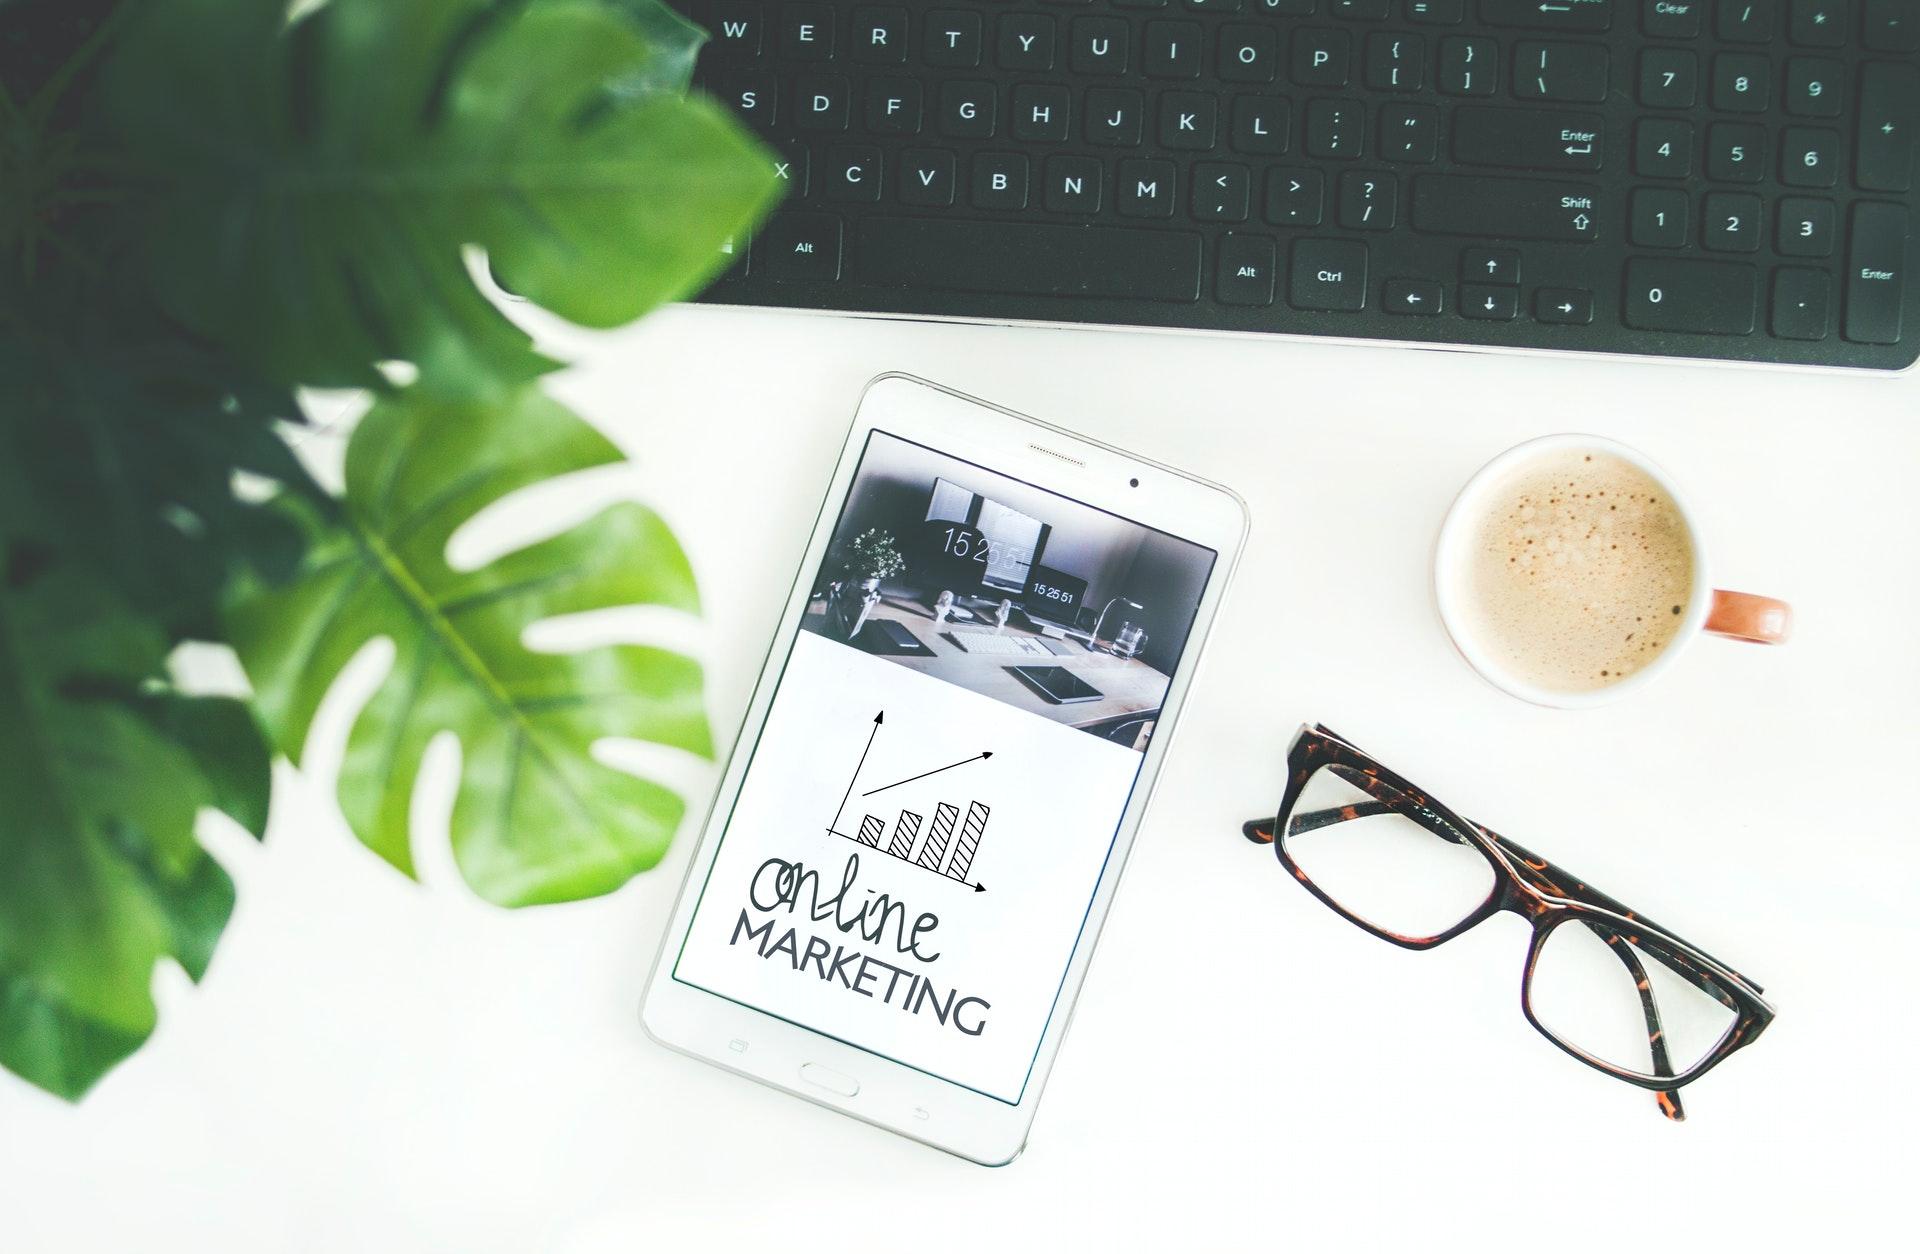 Digital Marketing Basics You Should Be Hands On